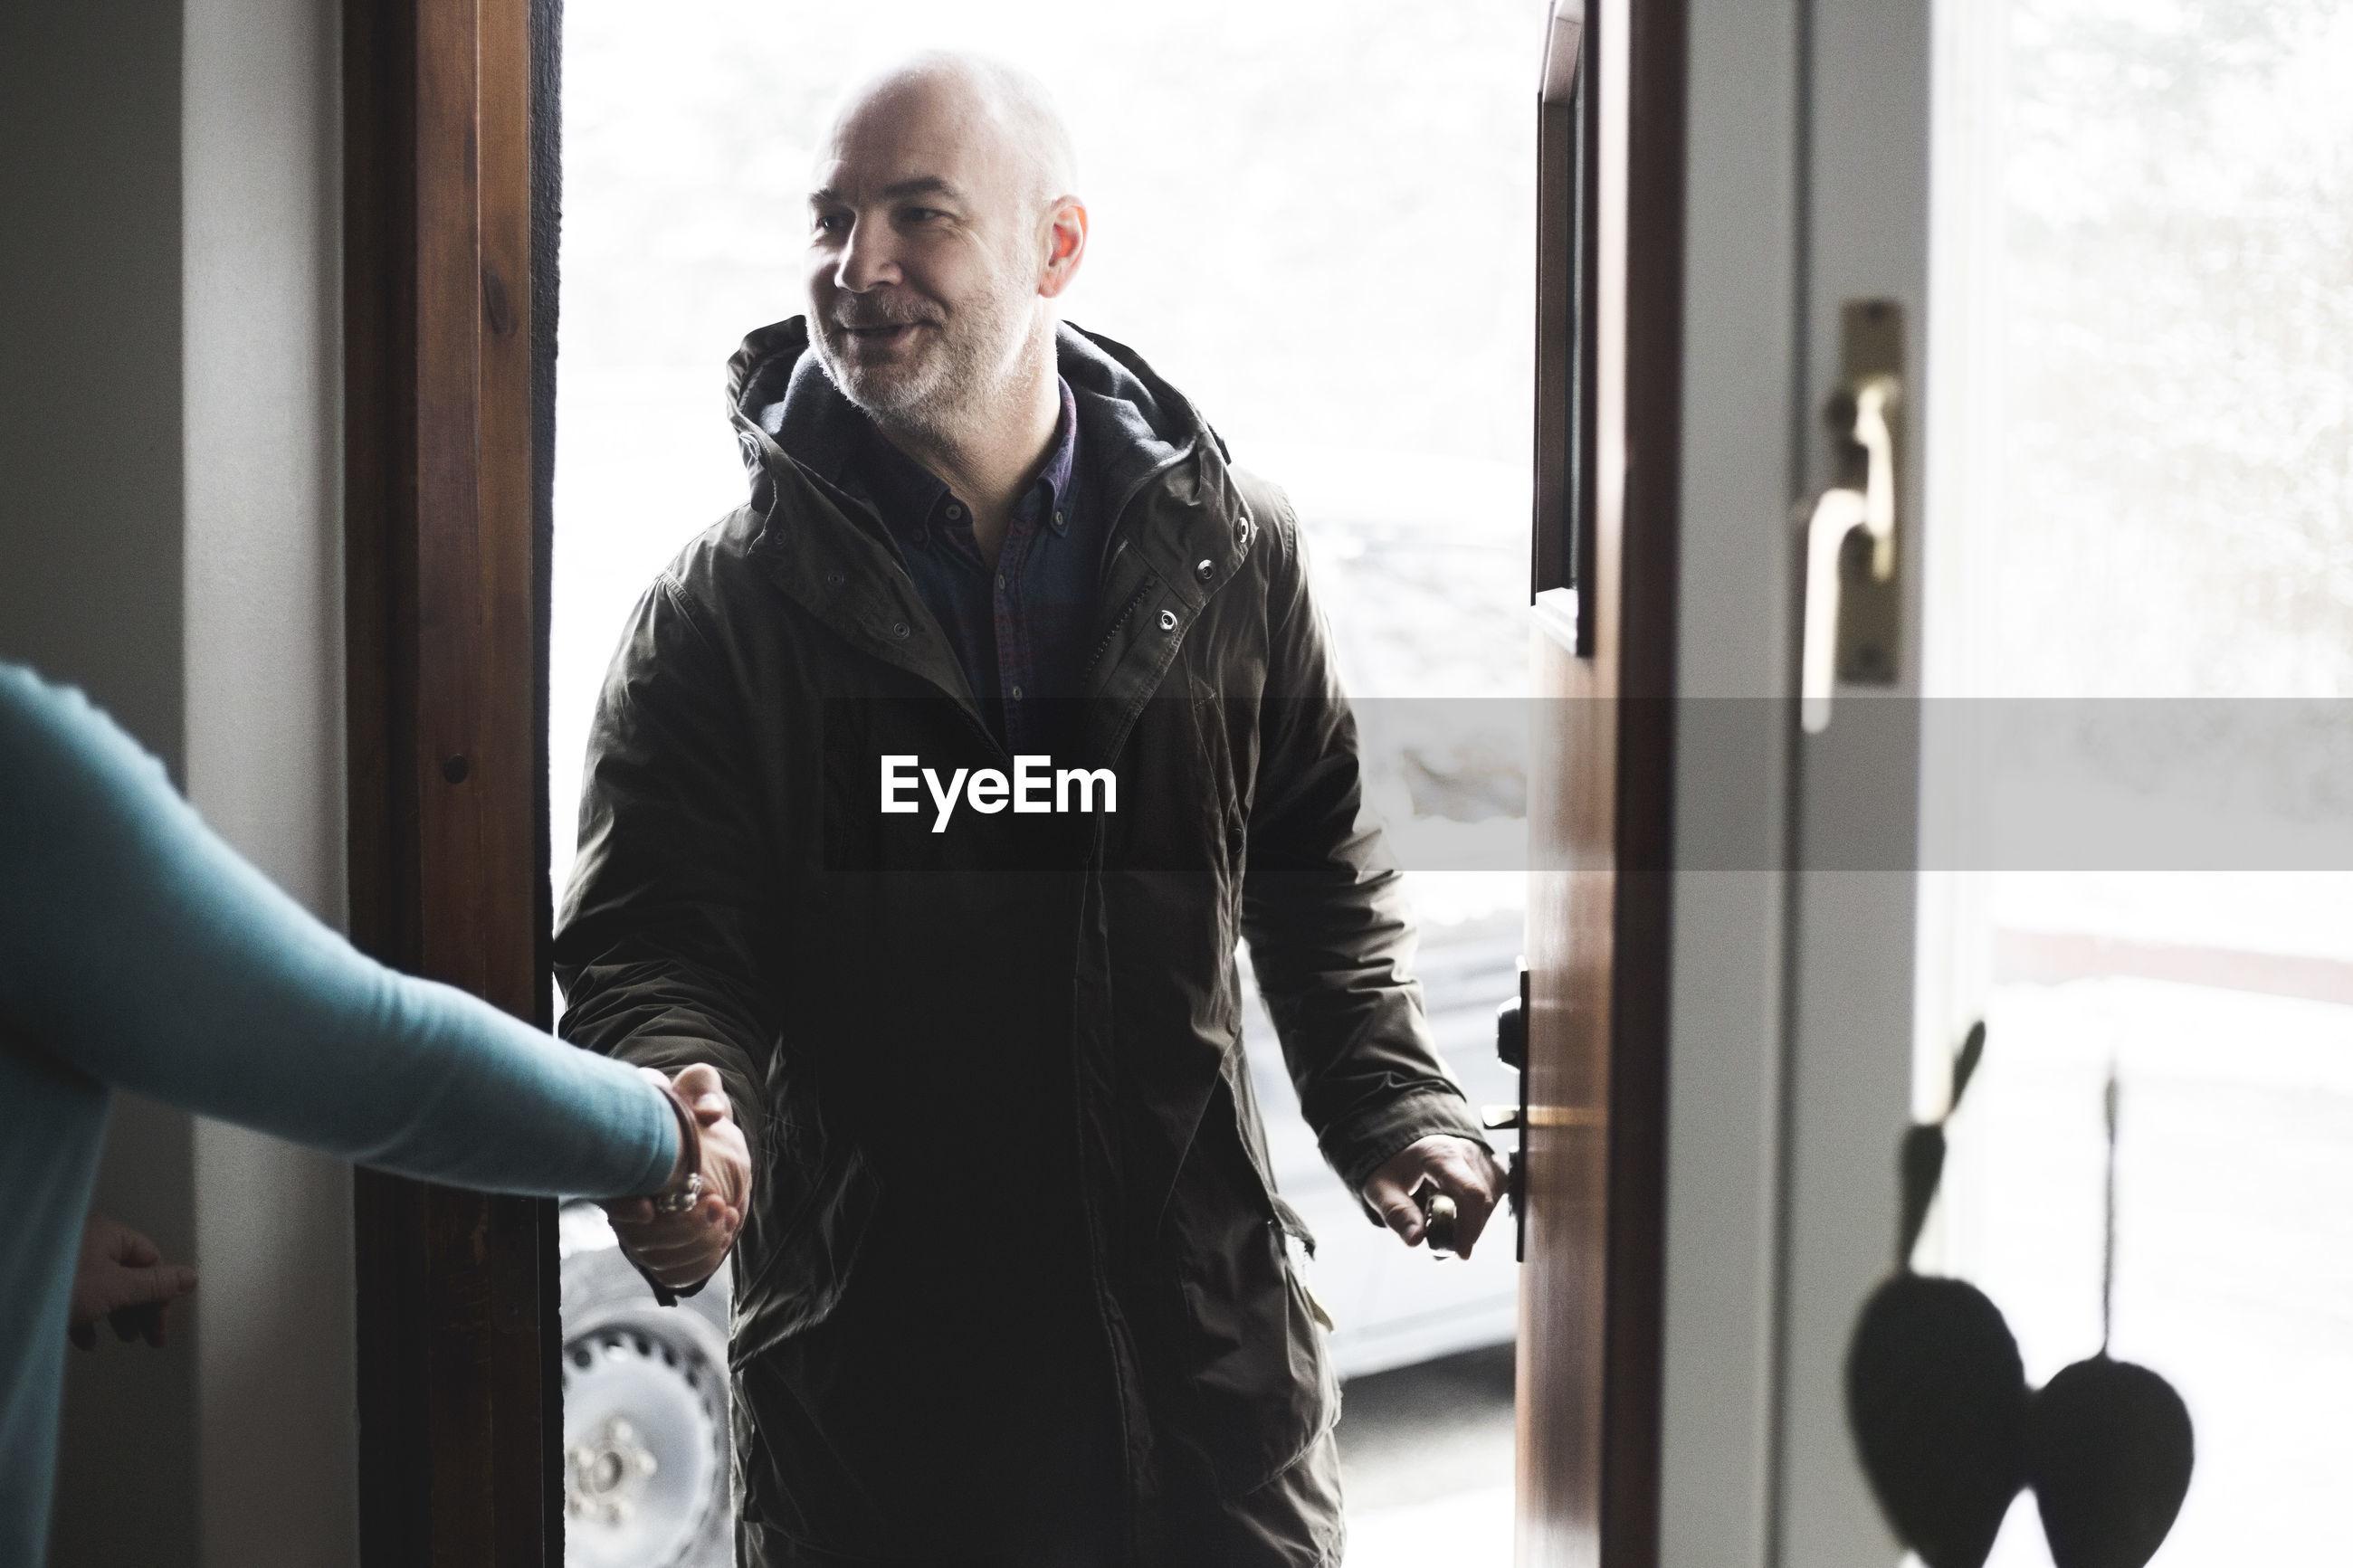 Mature man shaking hands with doctor at open doorway